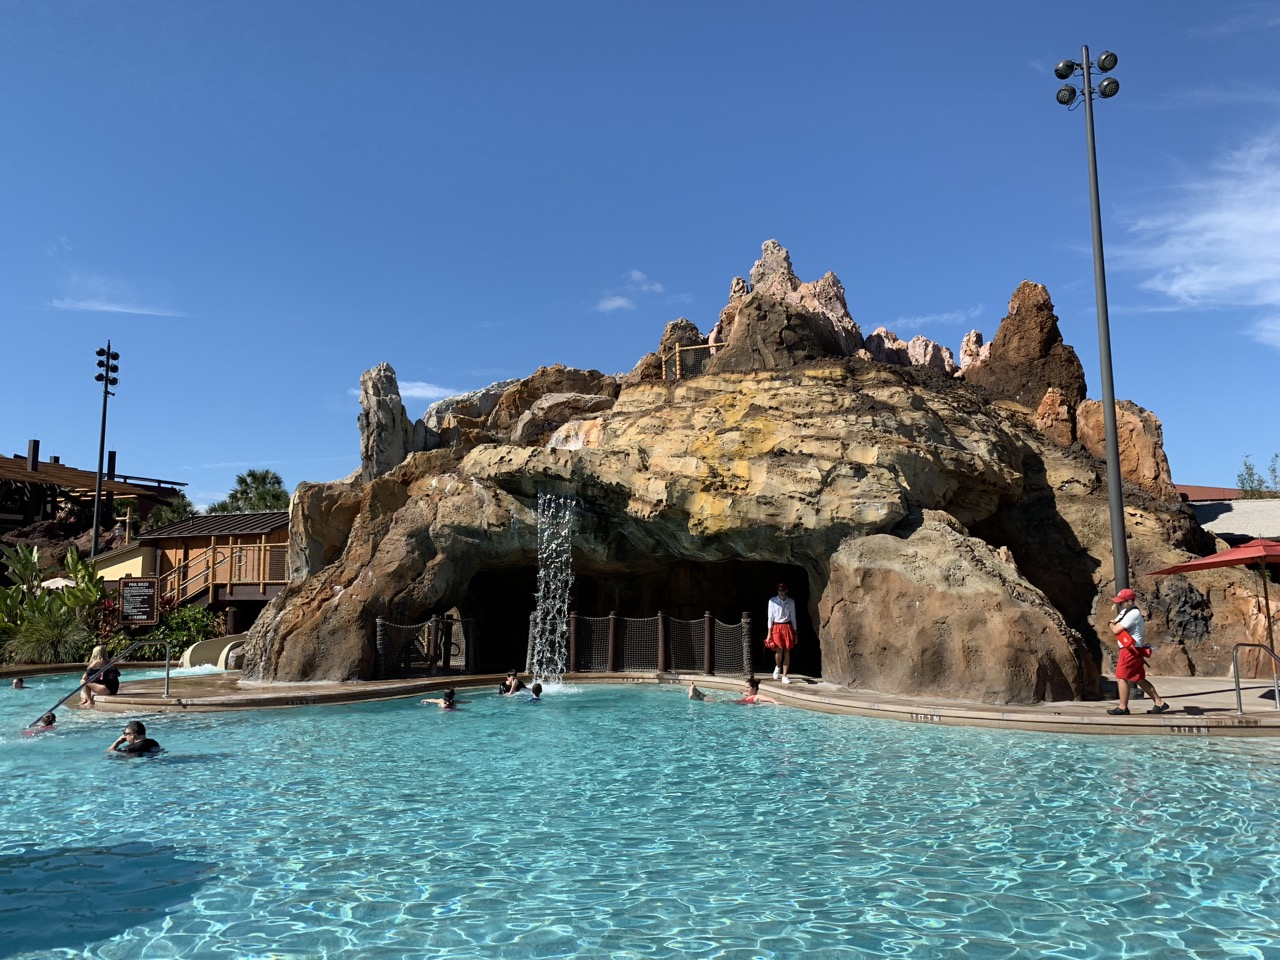 disney world best deluxe resort hotel ranking 10 polynesian pool.jpeg